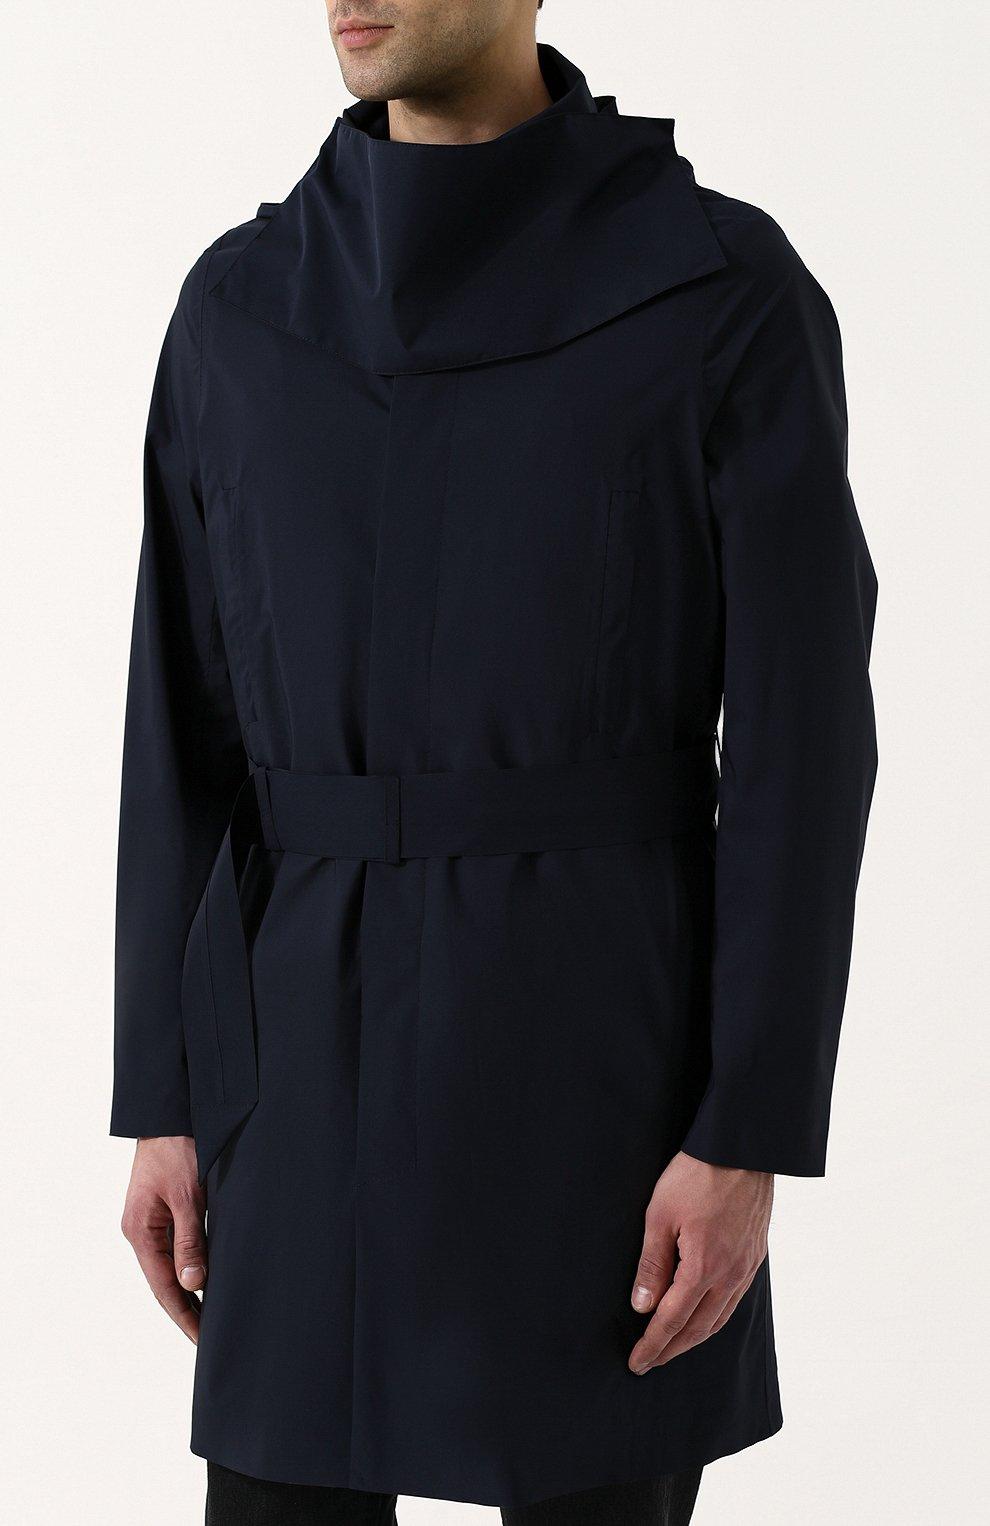 Мужской однобортный плащ на пуговицах с капюшоном NORWEGIAN RAIN темно-синего цвета, арт. SINGLE BREASTED MID/SLW | Фото 3